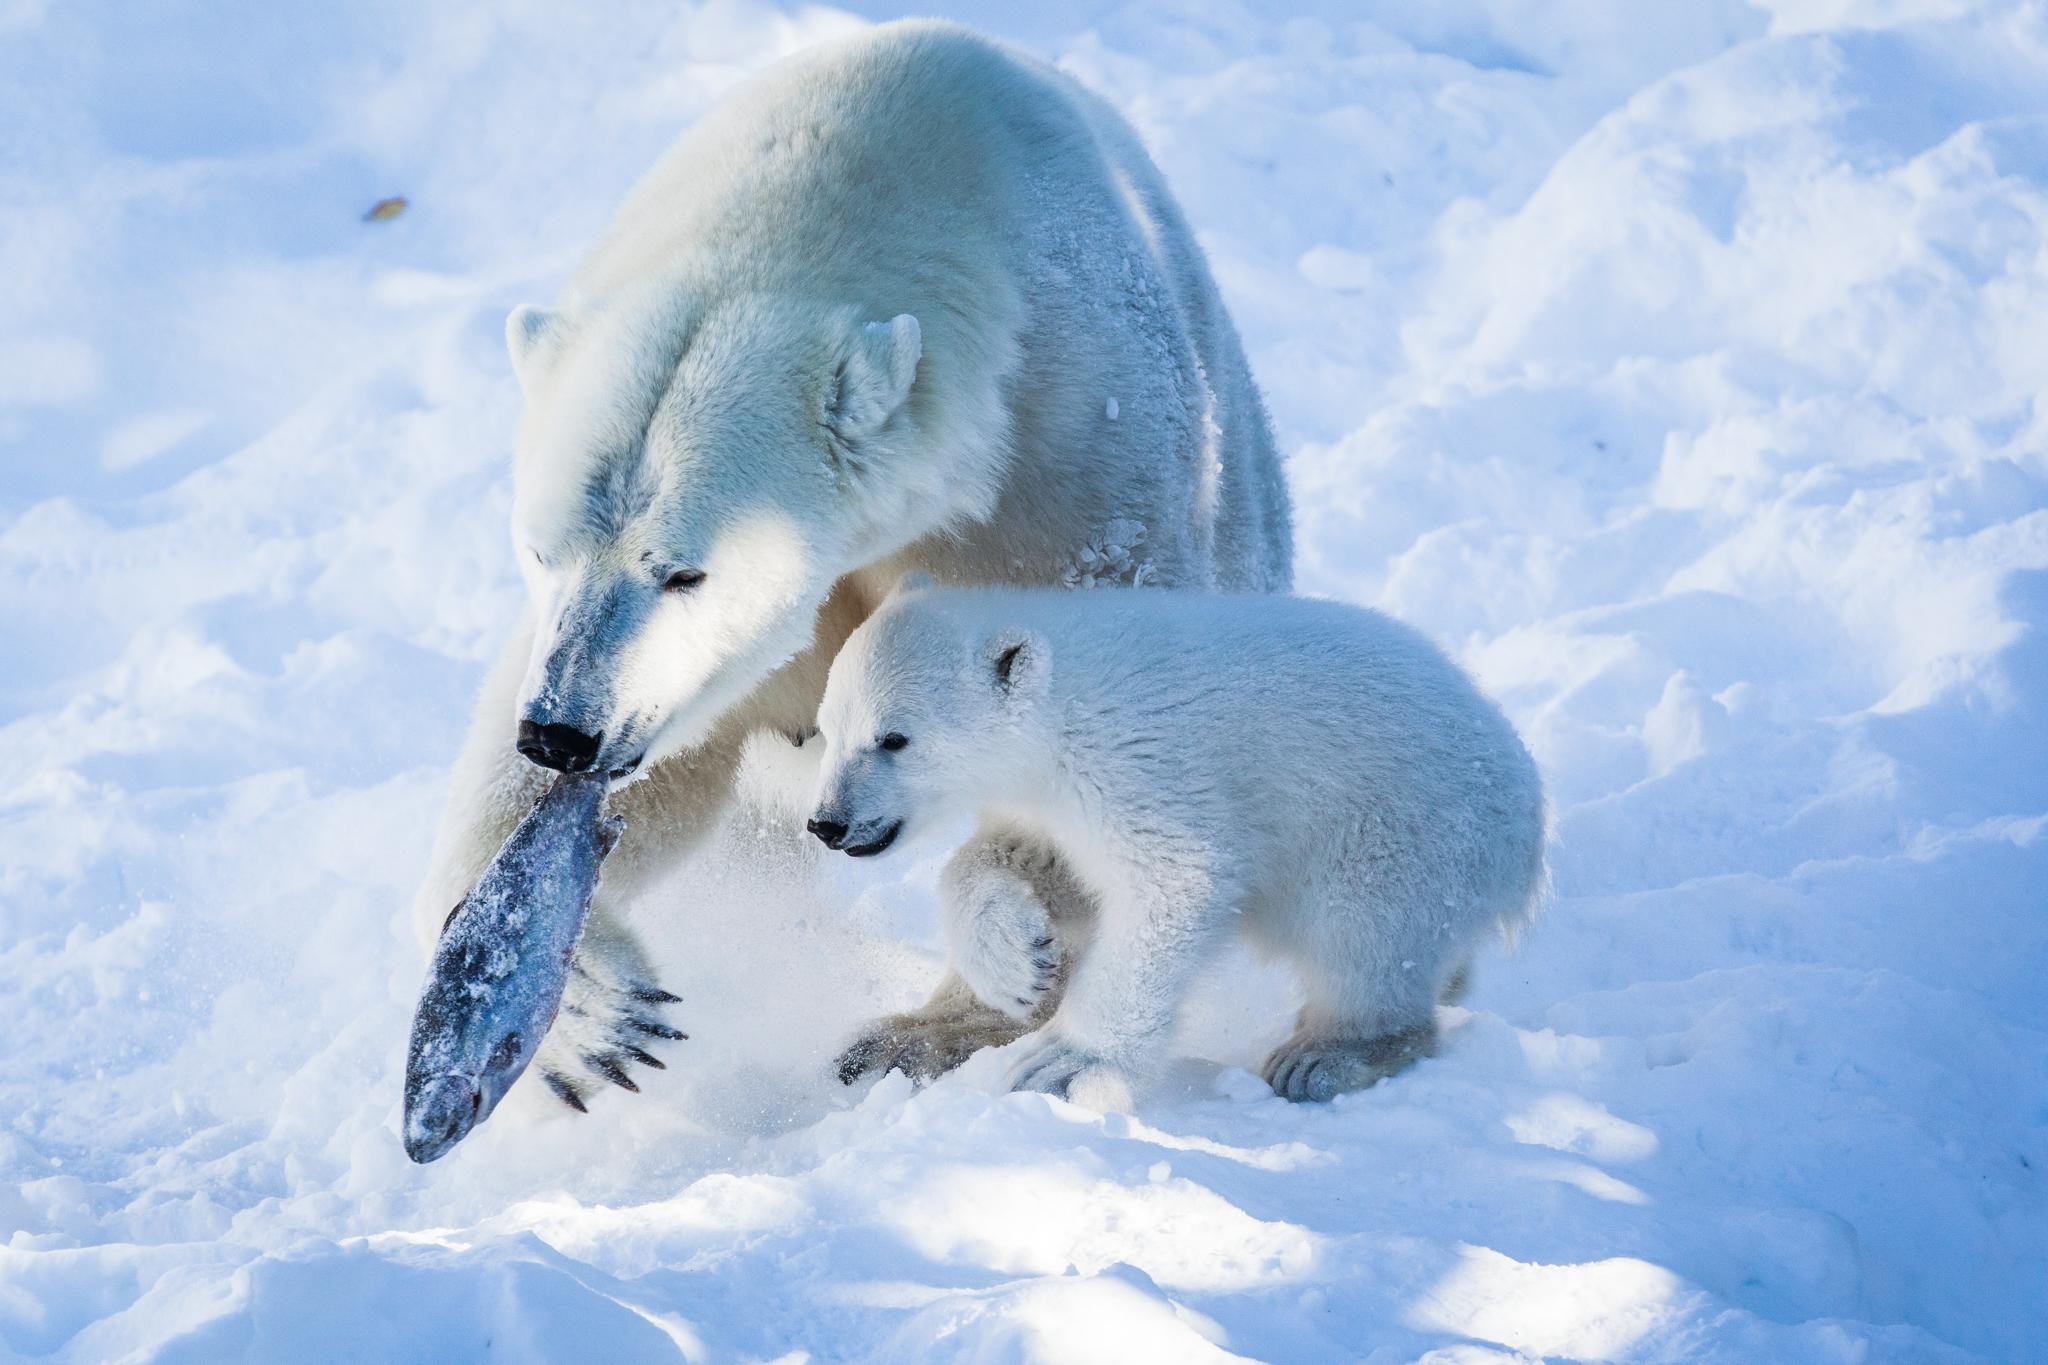 Ranua Zoo Polarbear